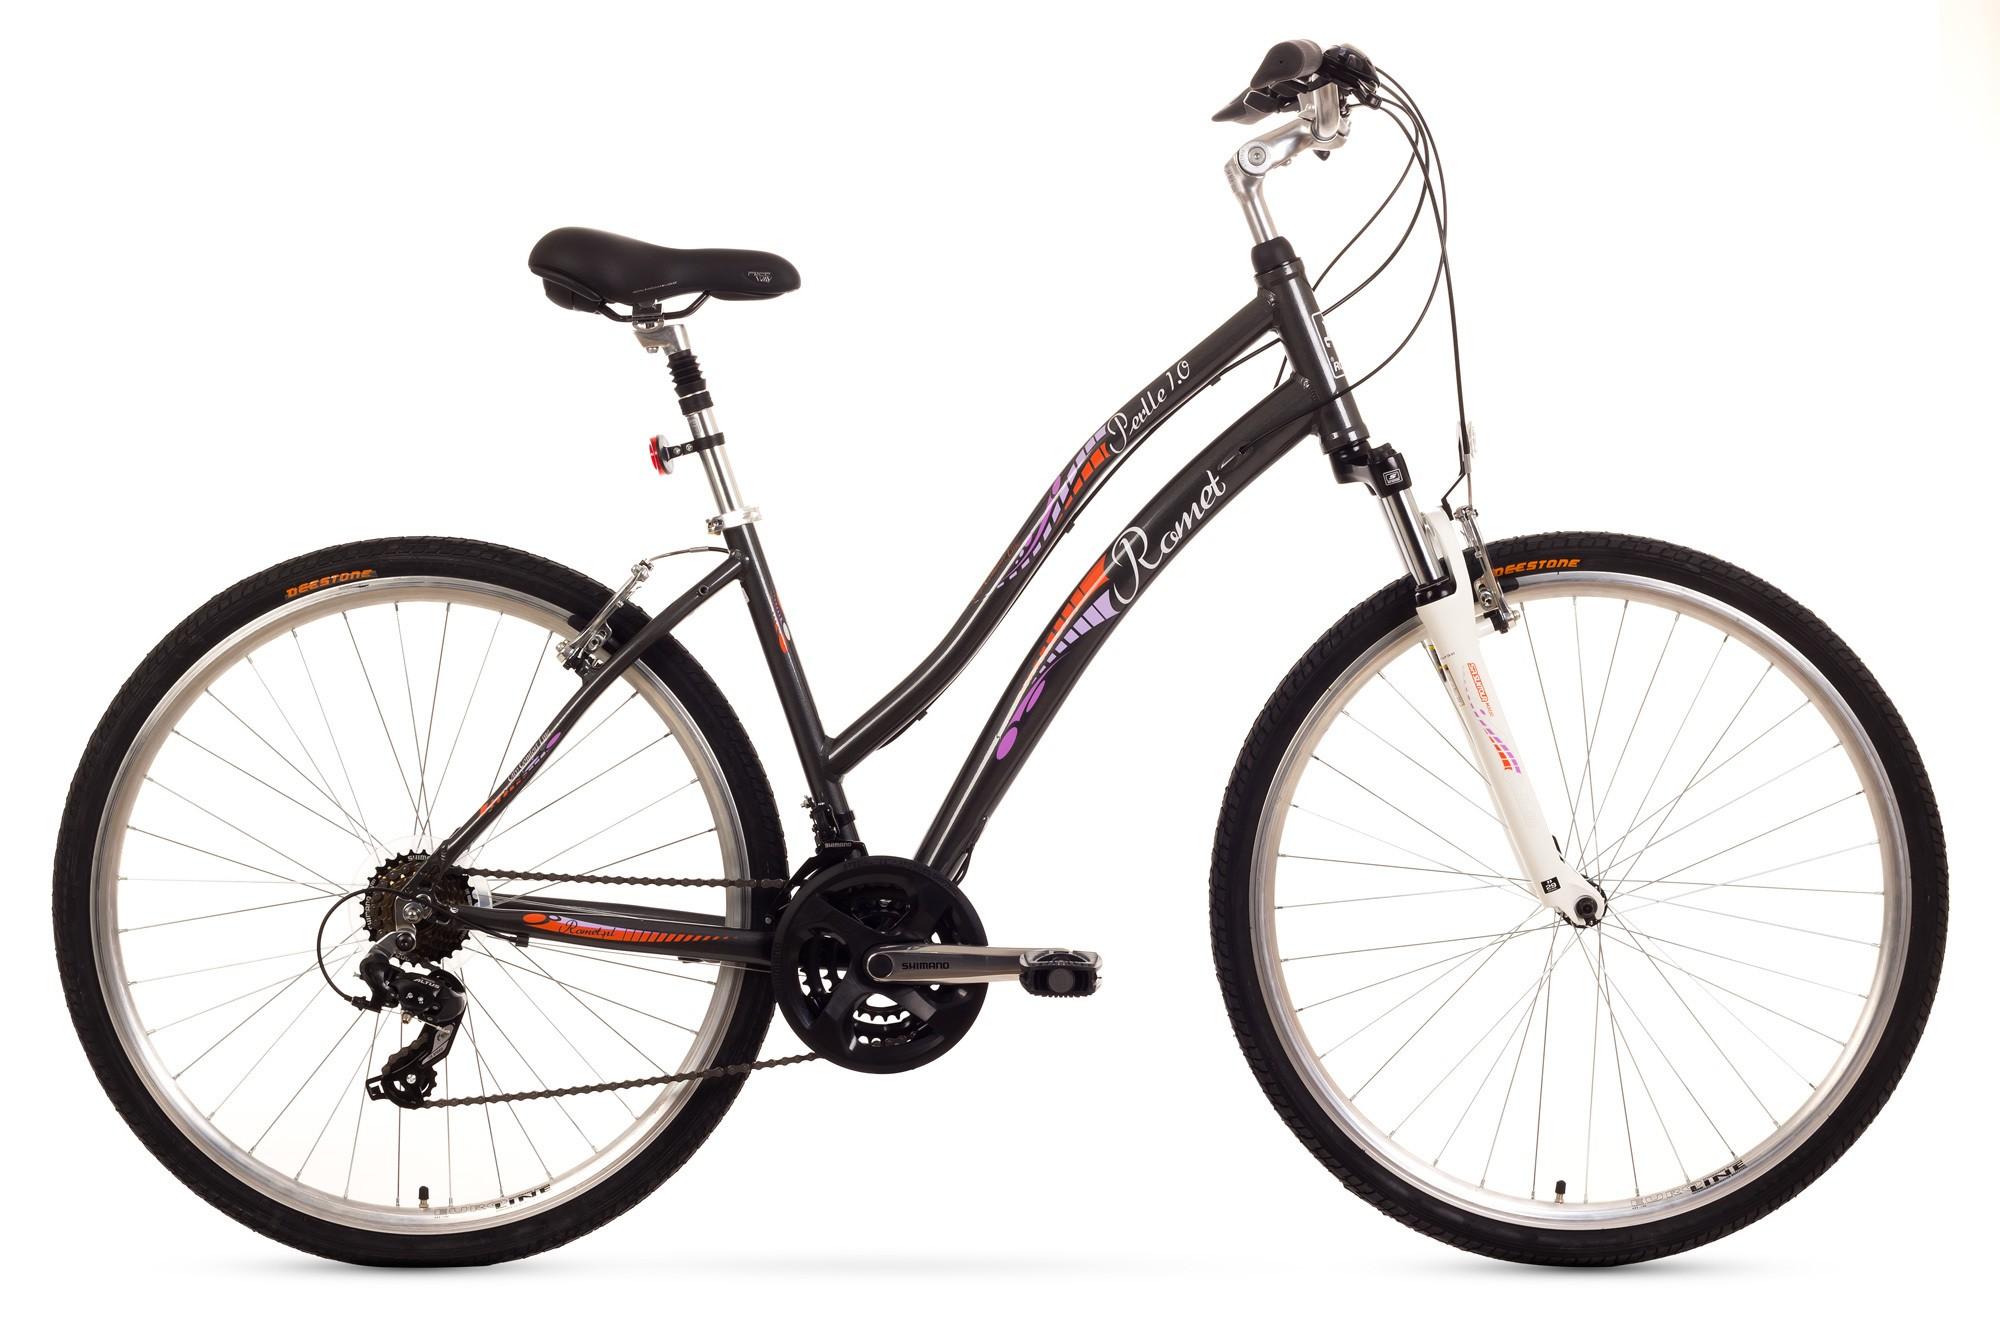 Bicicleta de oras Romet Perlle 1.0 - grafit